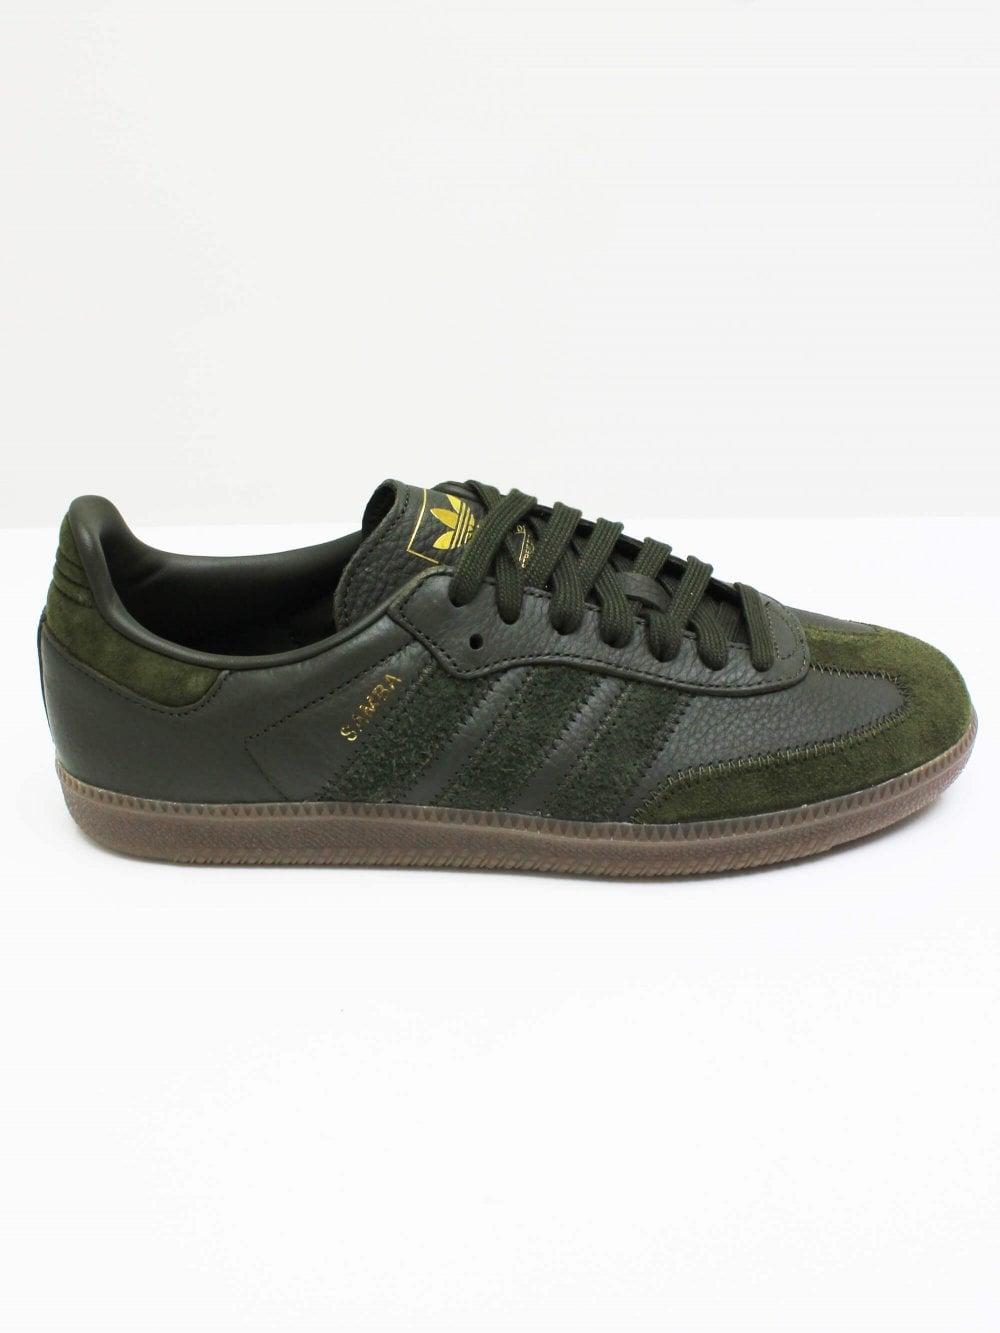 factory authentic run shoes meet Samba OG - Night Cargo